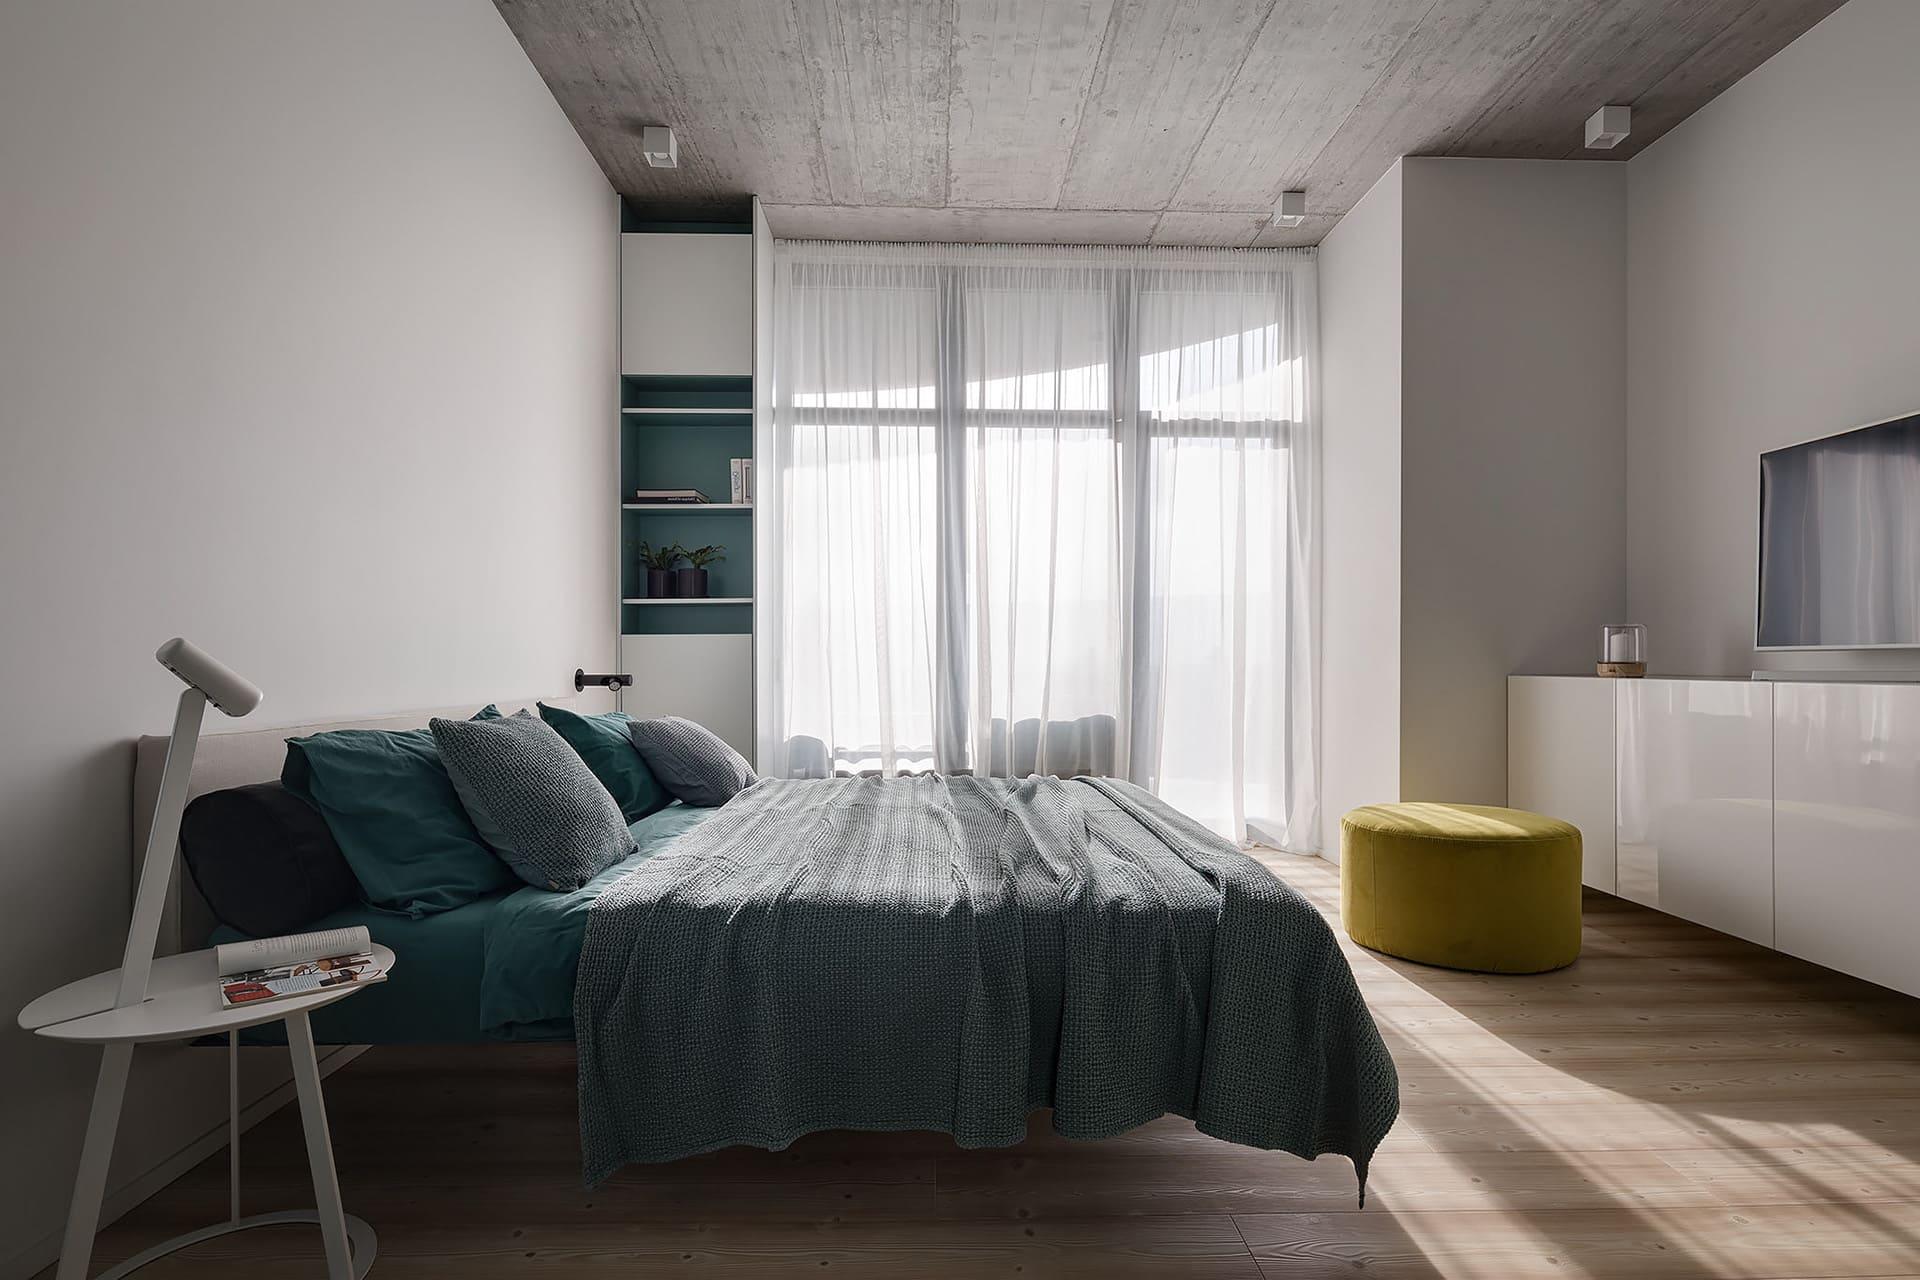 интерьер спальни фото 60